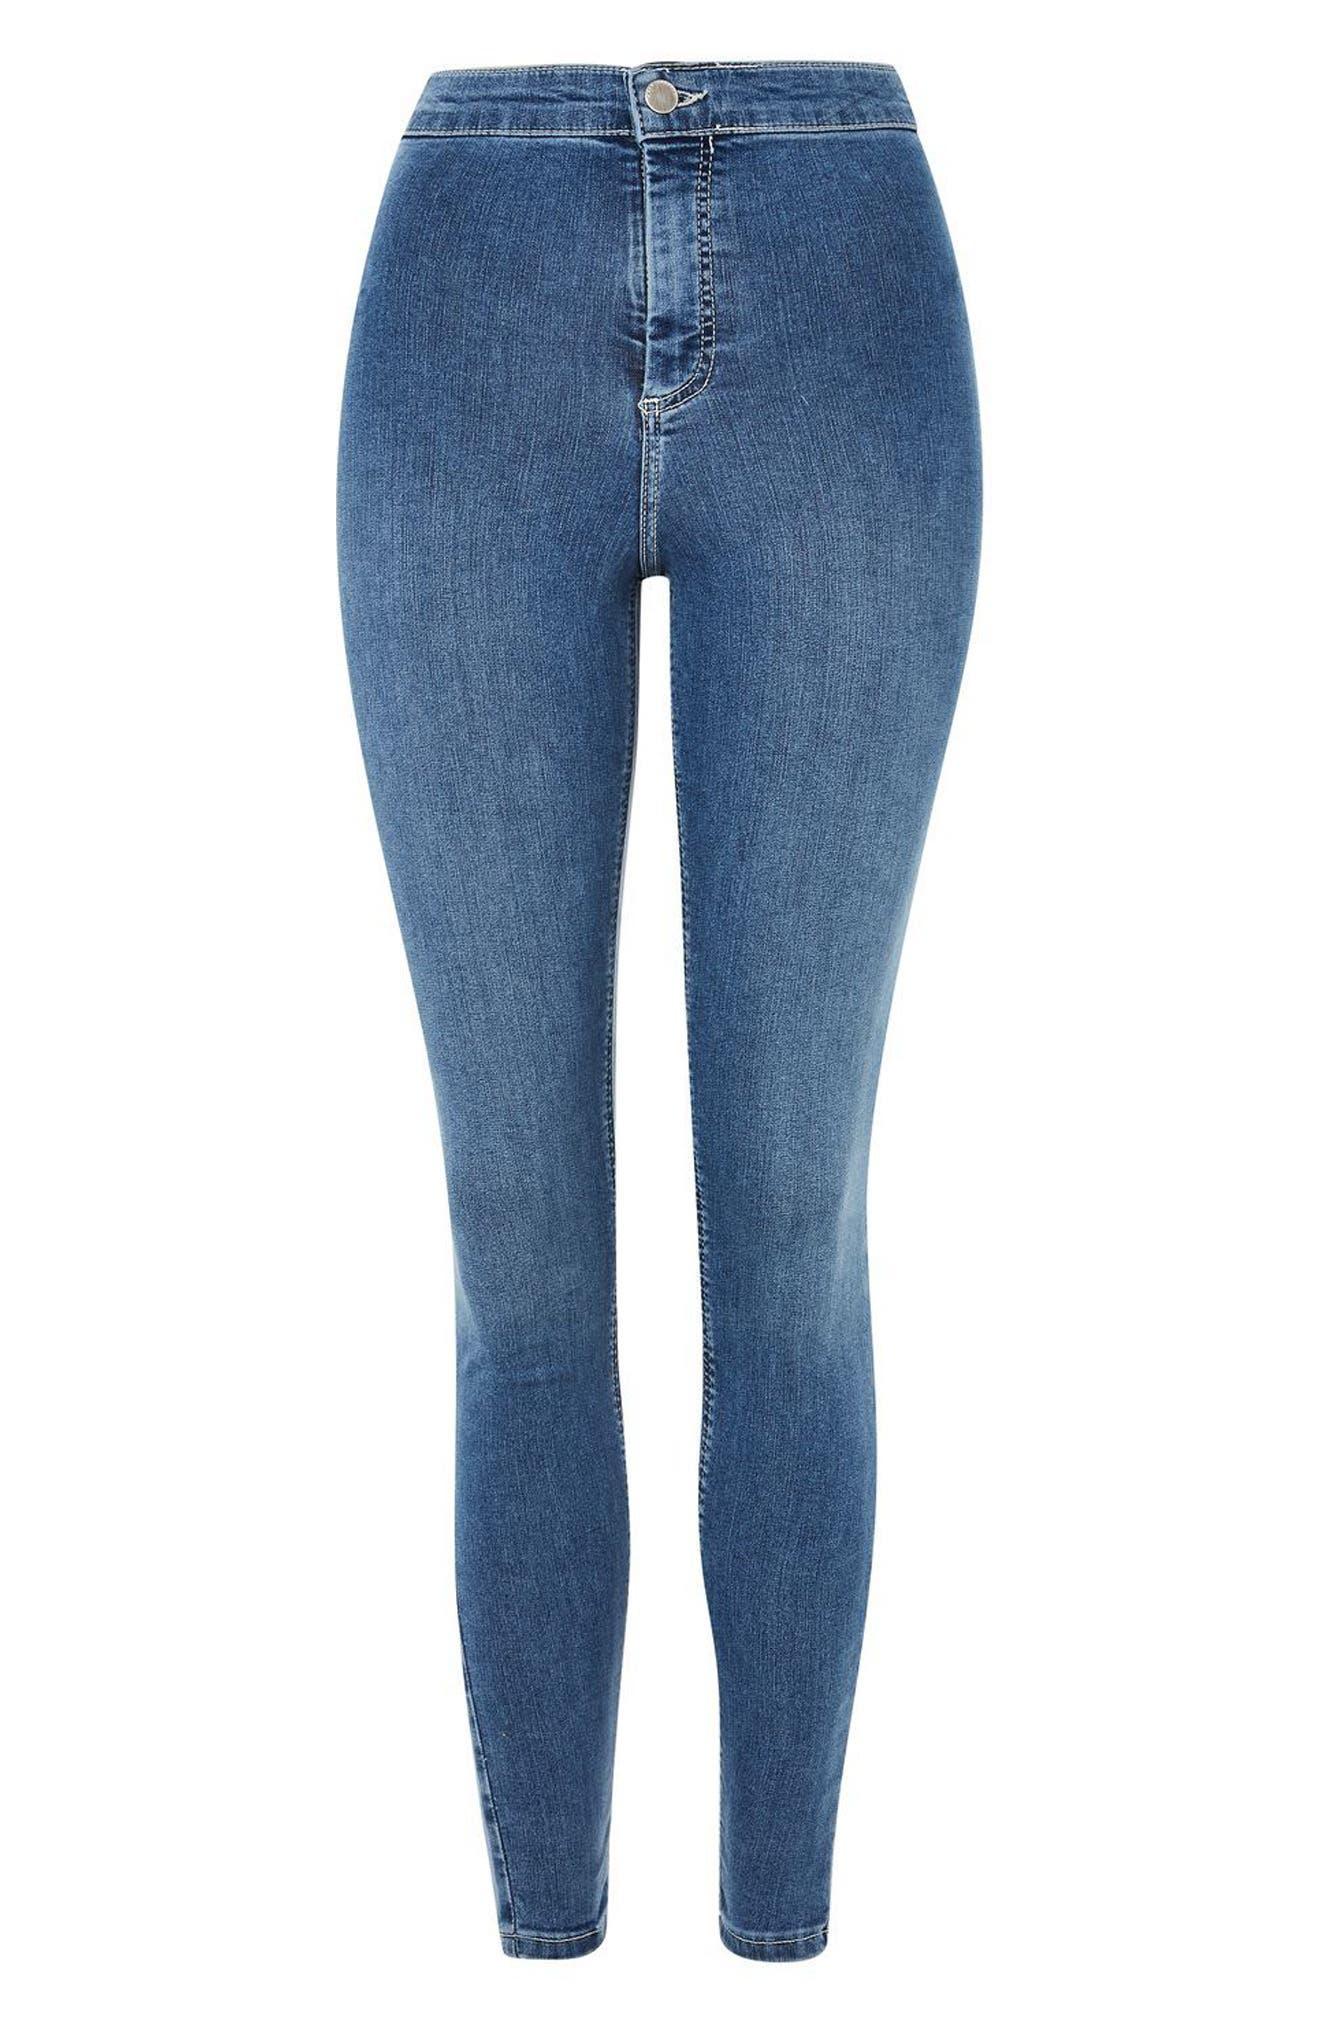 Joni Contrast Stitch High Rise Skinny Jeans,                             Alternate thumbnail 3, color,                             Mid Denim